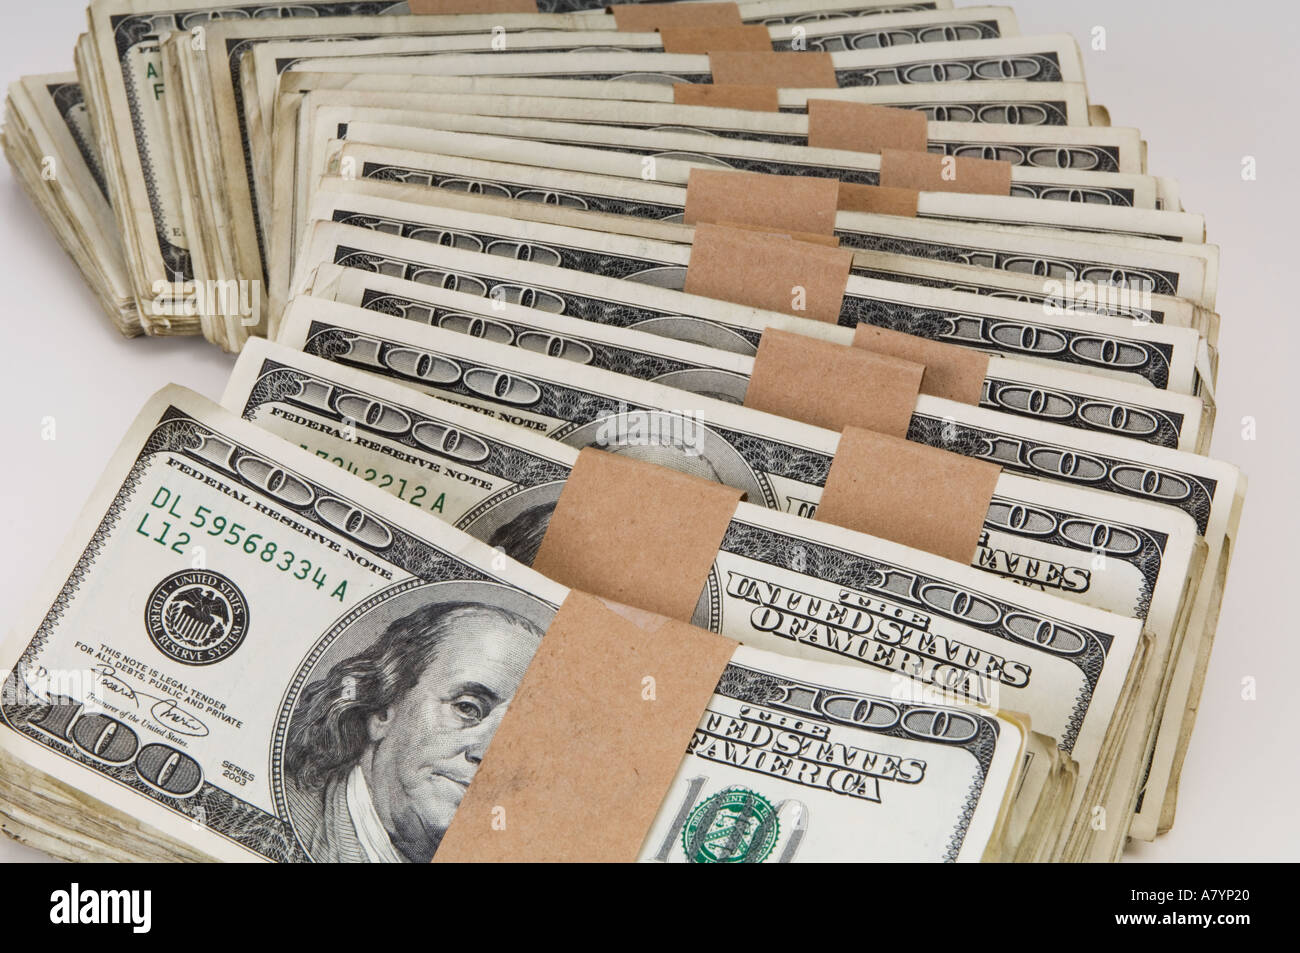 stacks of 100 dollar bills us stock photo 3897887 alamy